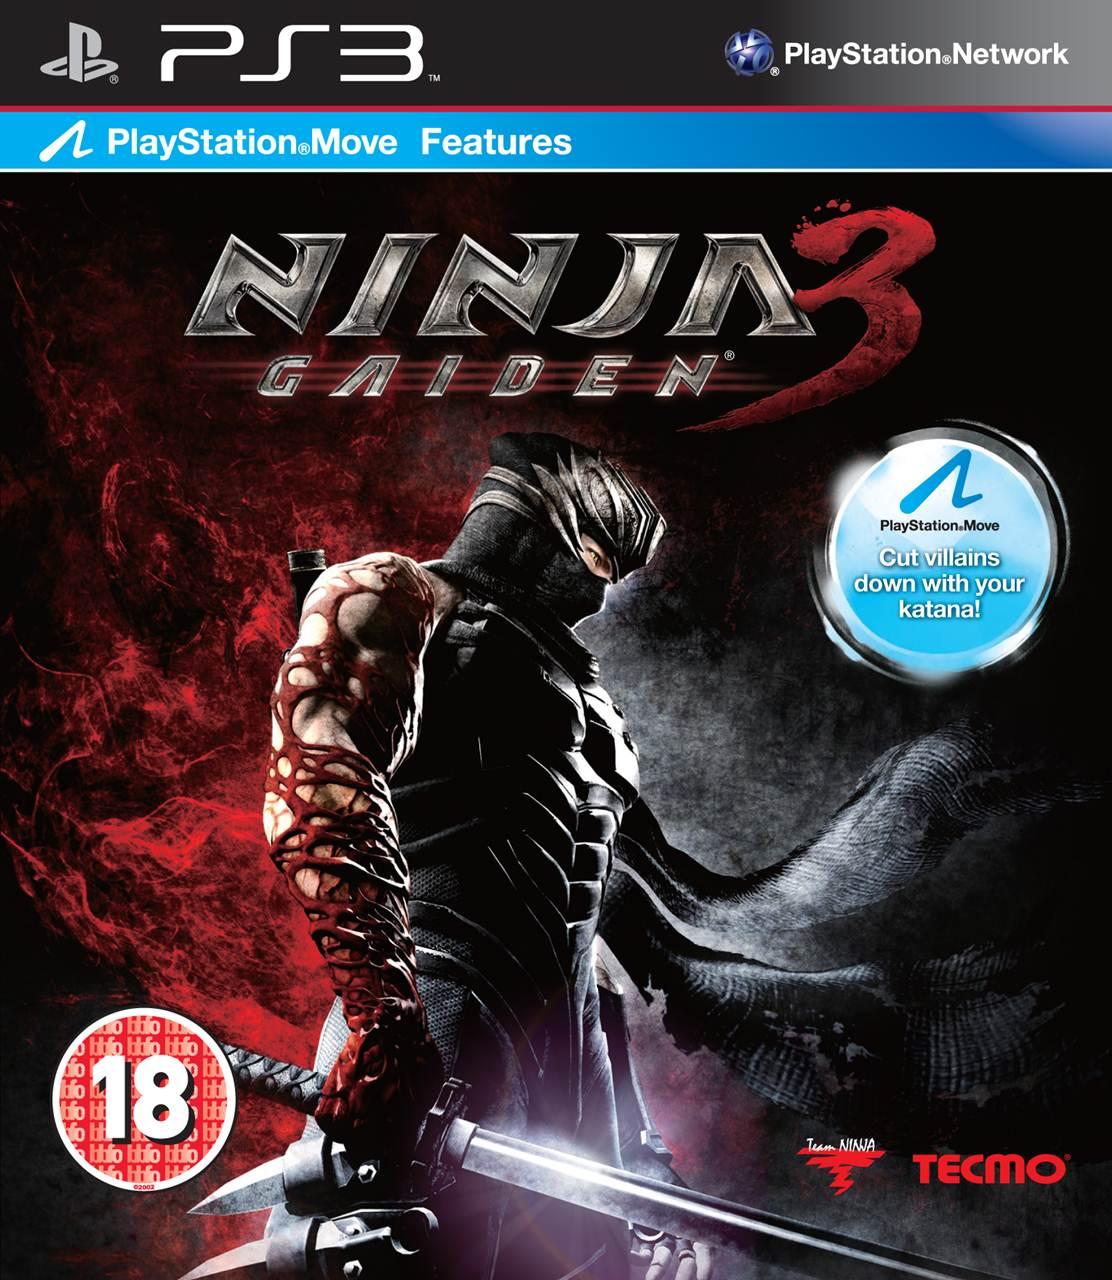 Ninja Gaiden 3: Ninja Gaiden 3: A New Collection Of Finalised Pack Shots